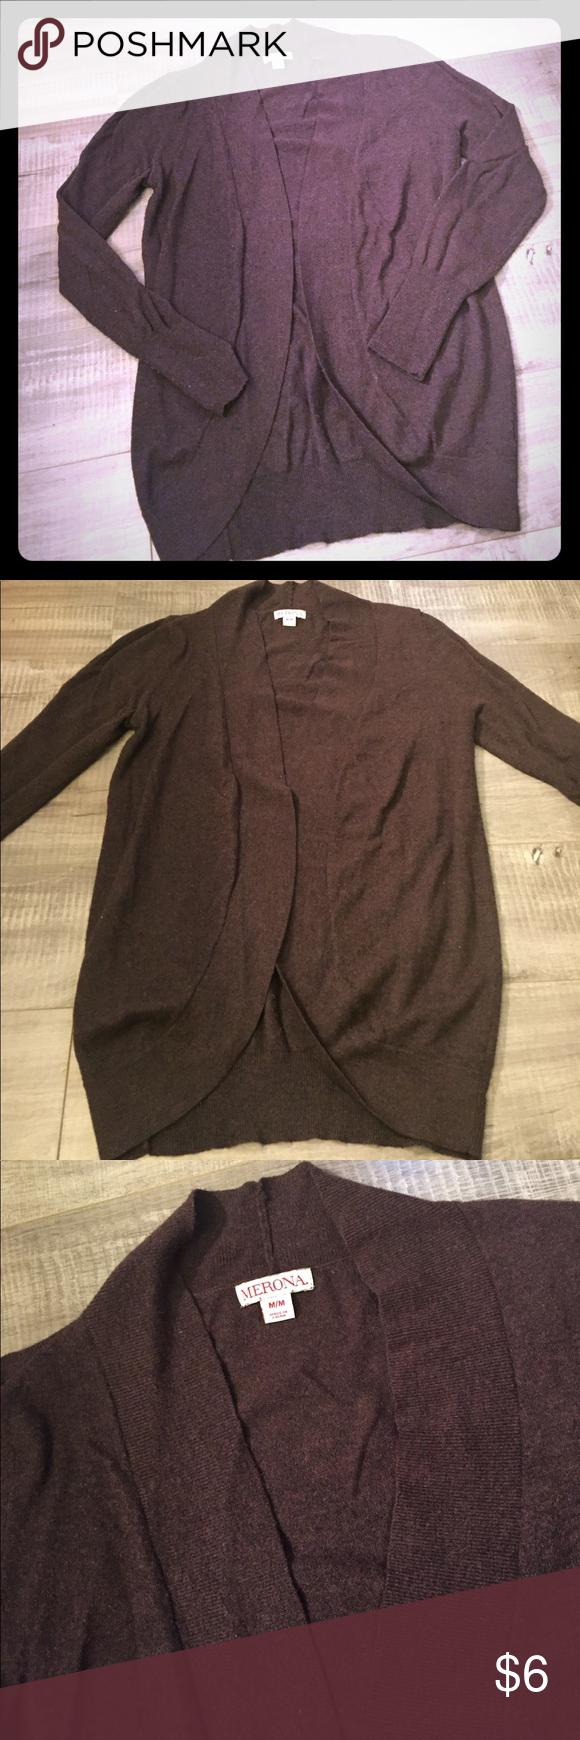 Chocolate Brown Open Cardigan Sweater | Chocolate brown, Open ...